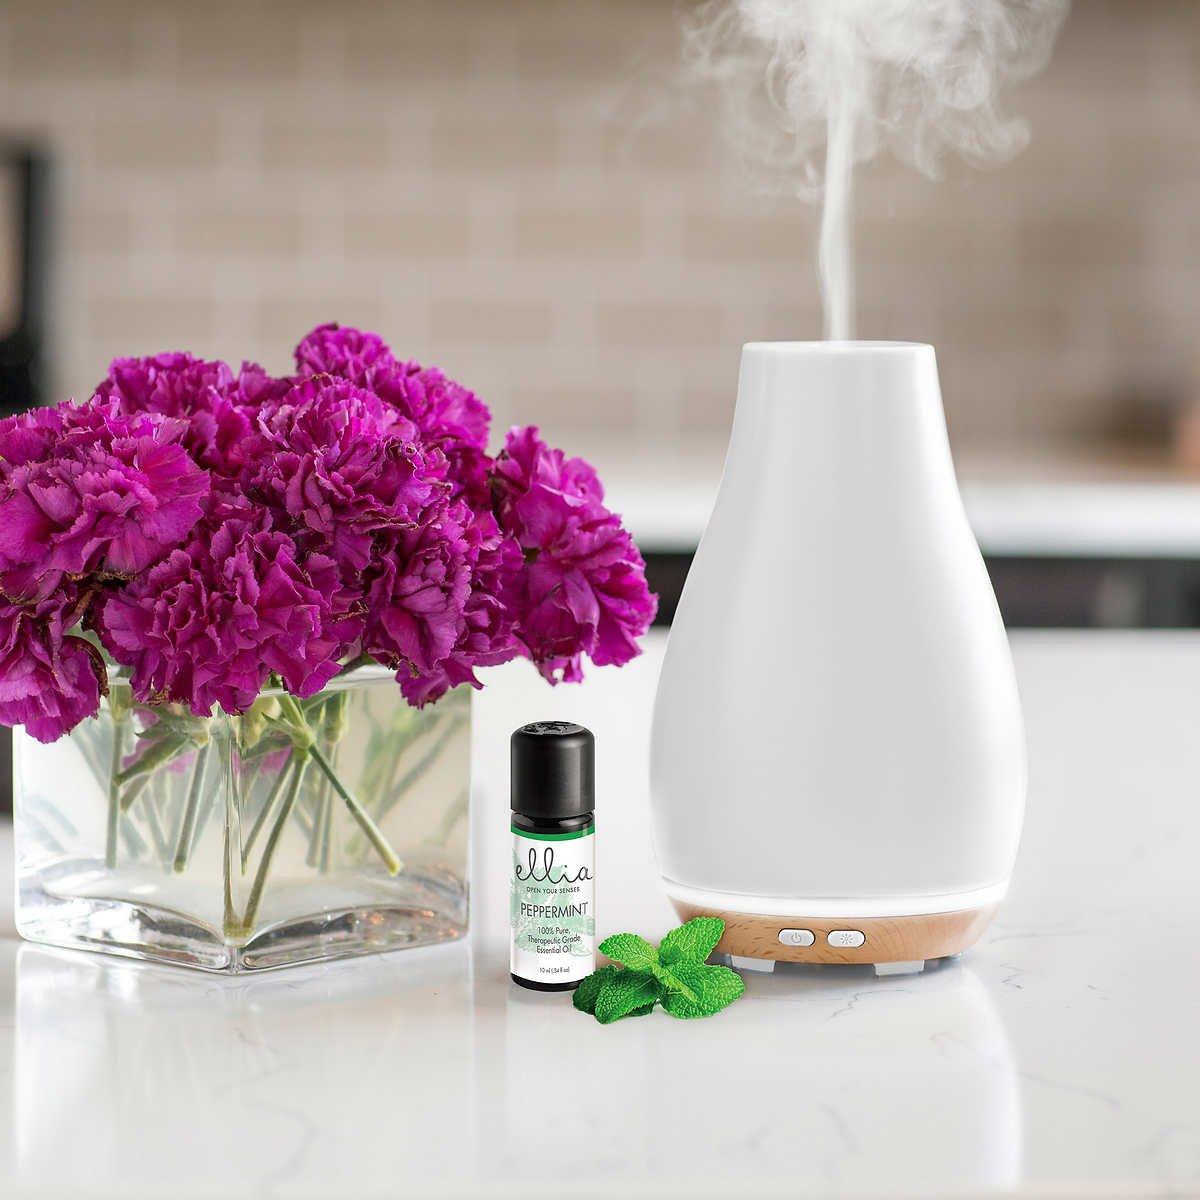 Blossom Essential Homedics Aromatherapy Diffuser Ellia